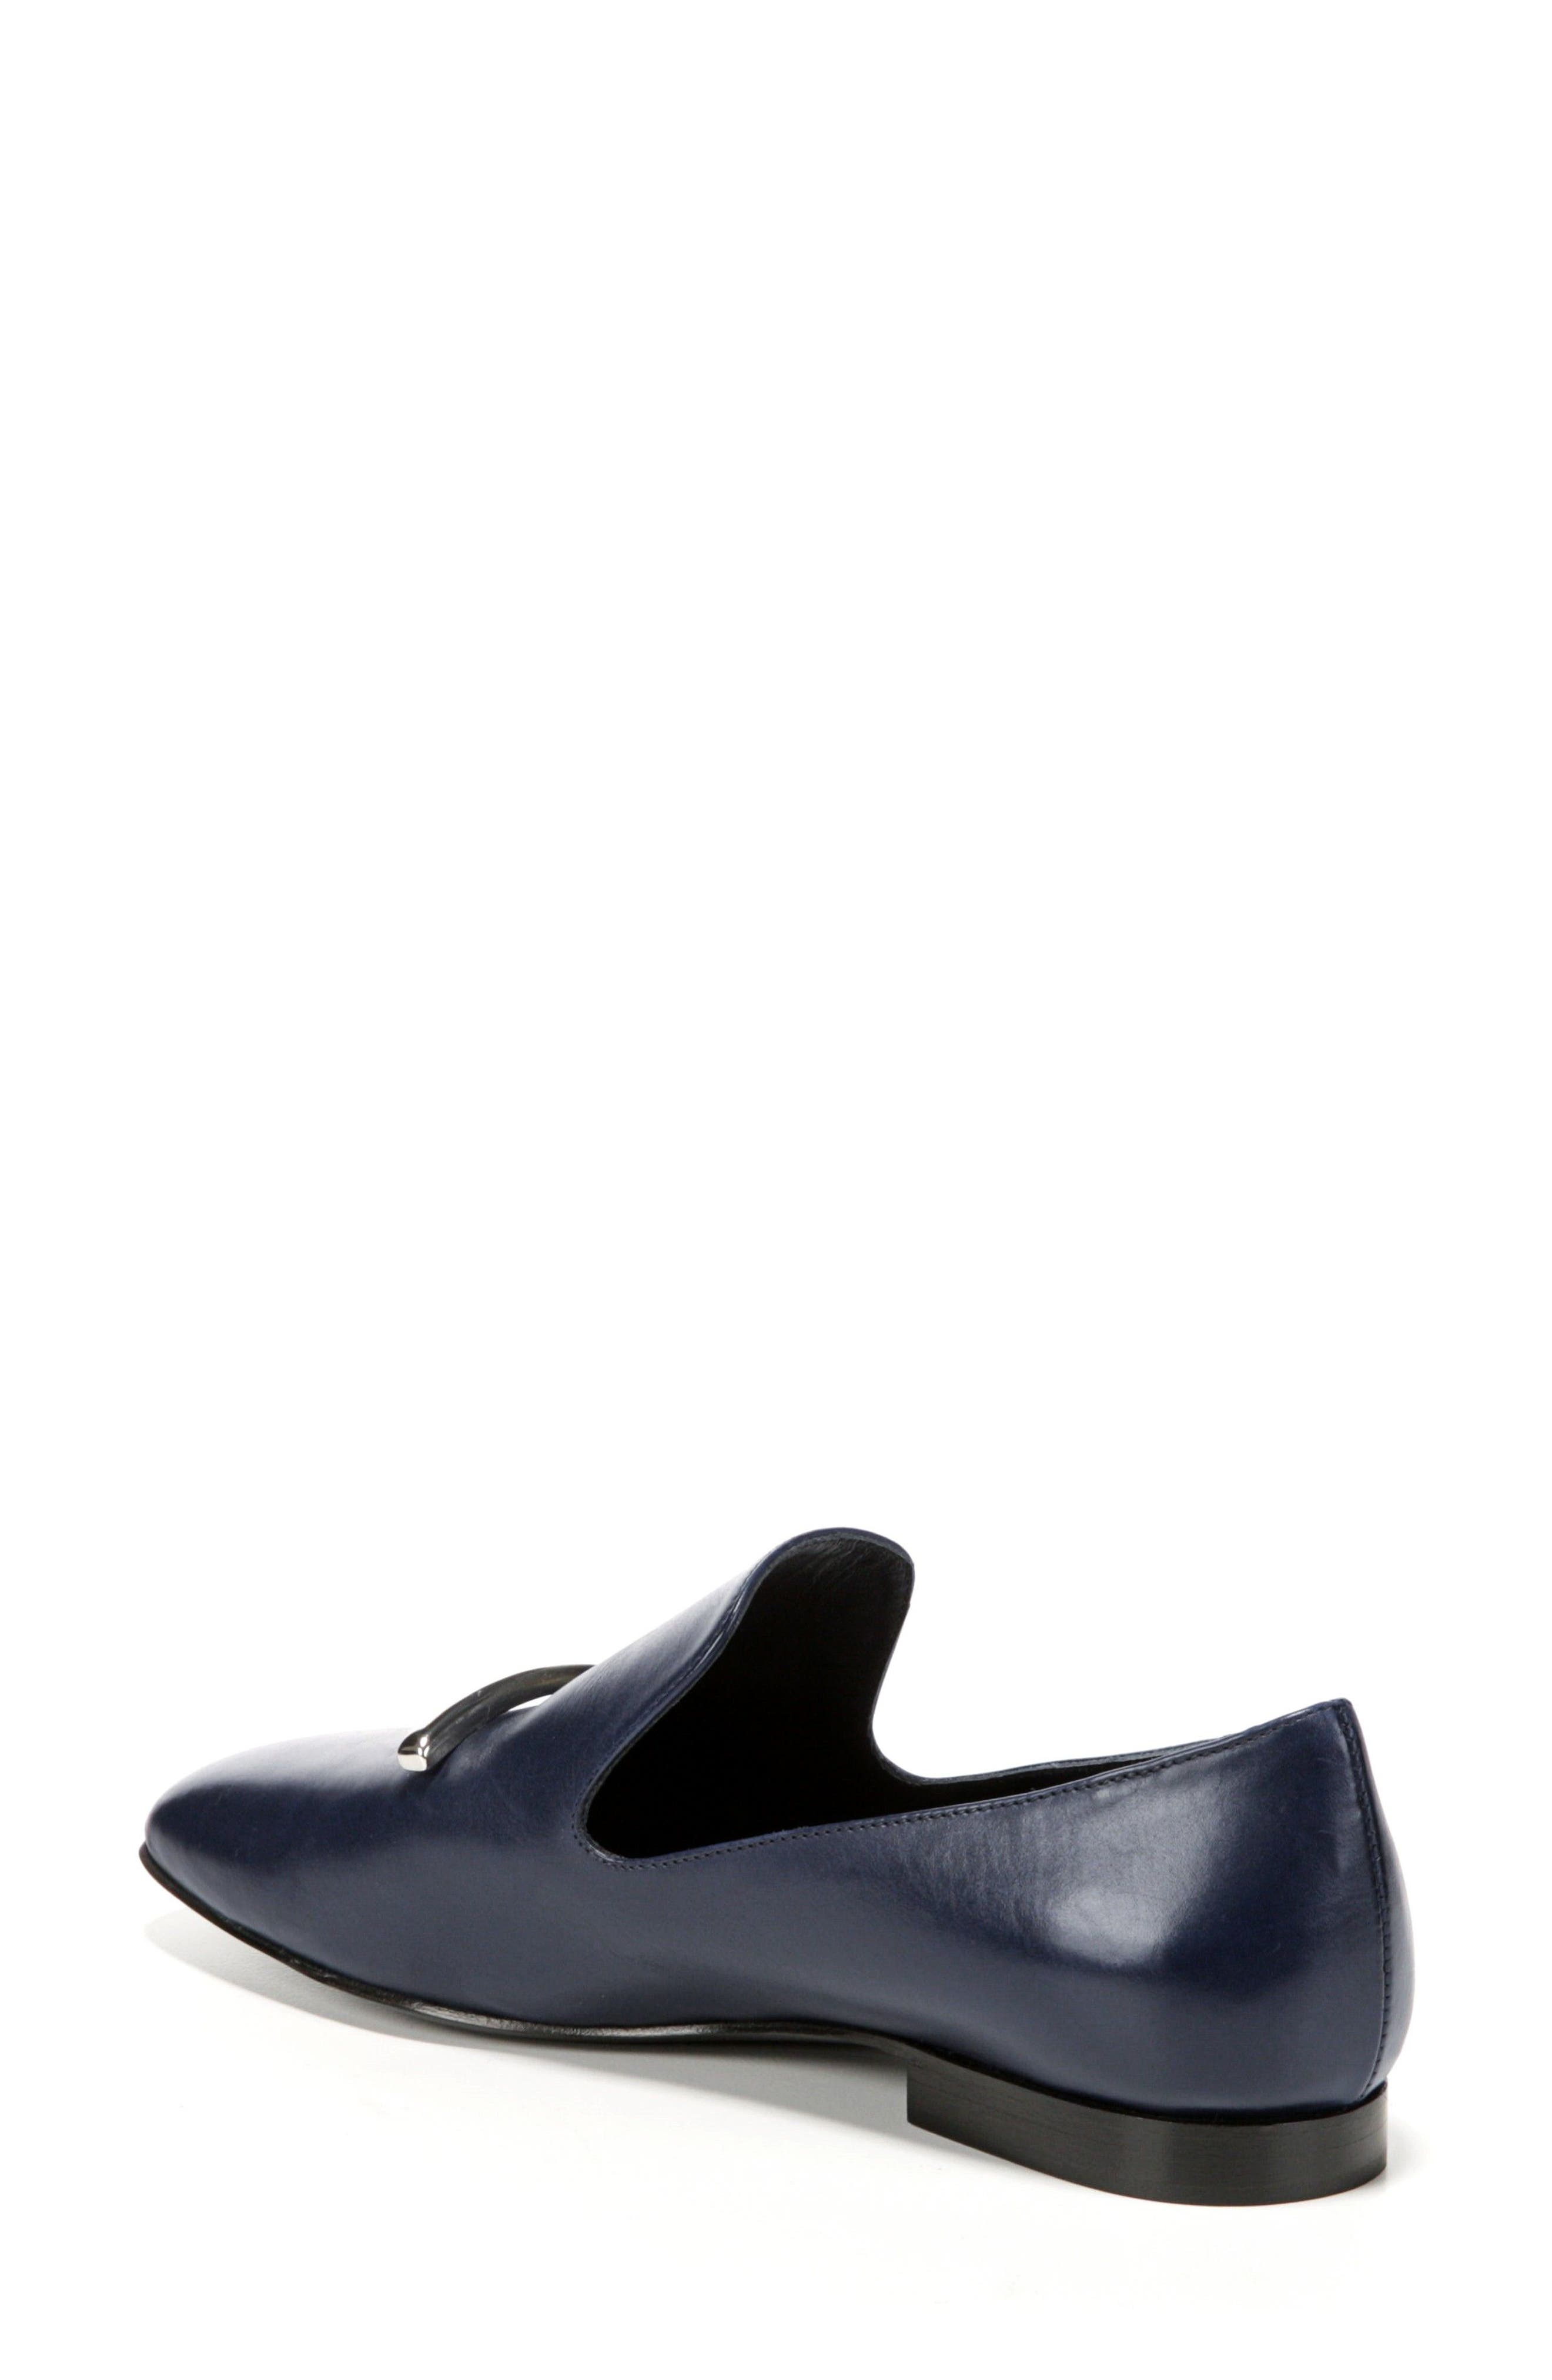 Tallis Flat Loafer,                             Alternate thumbnail 2, color,                             Midnight Leather